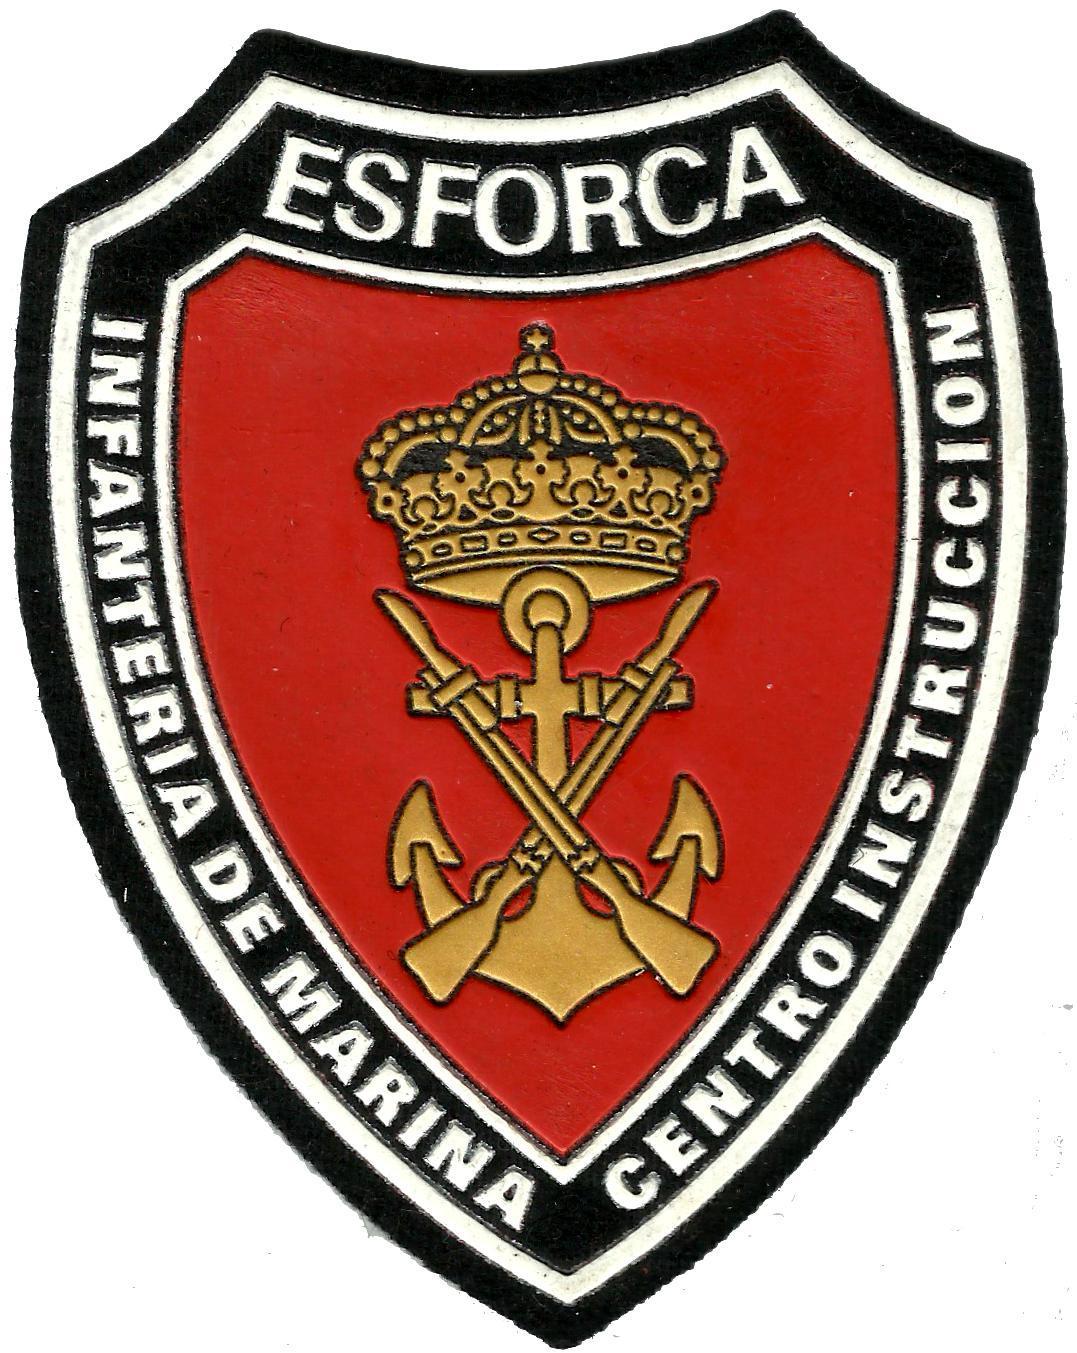 Ejercito Armada Infantería de Marina ESFORCA Centro de instrucción parche insignia emblema distintivo